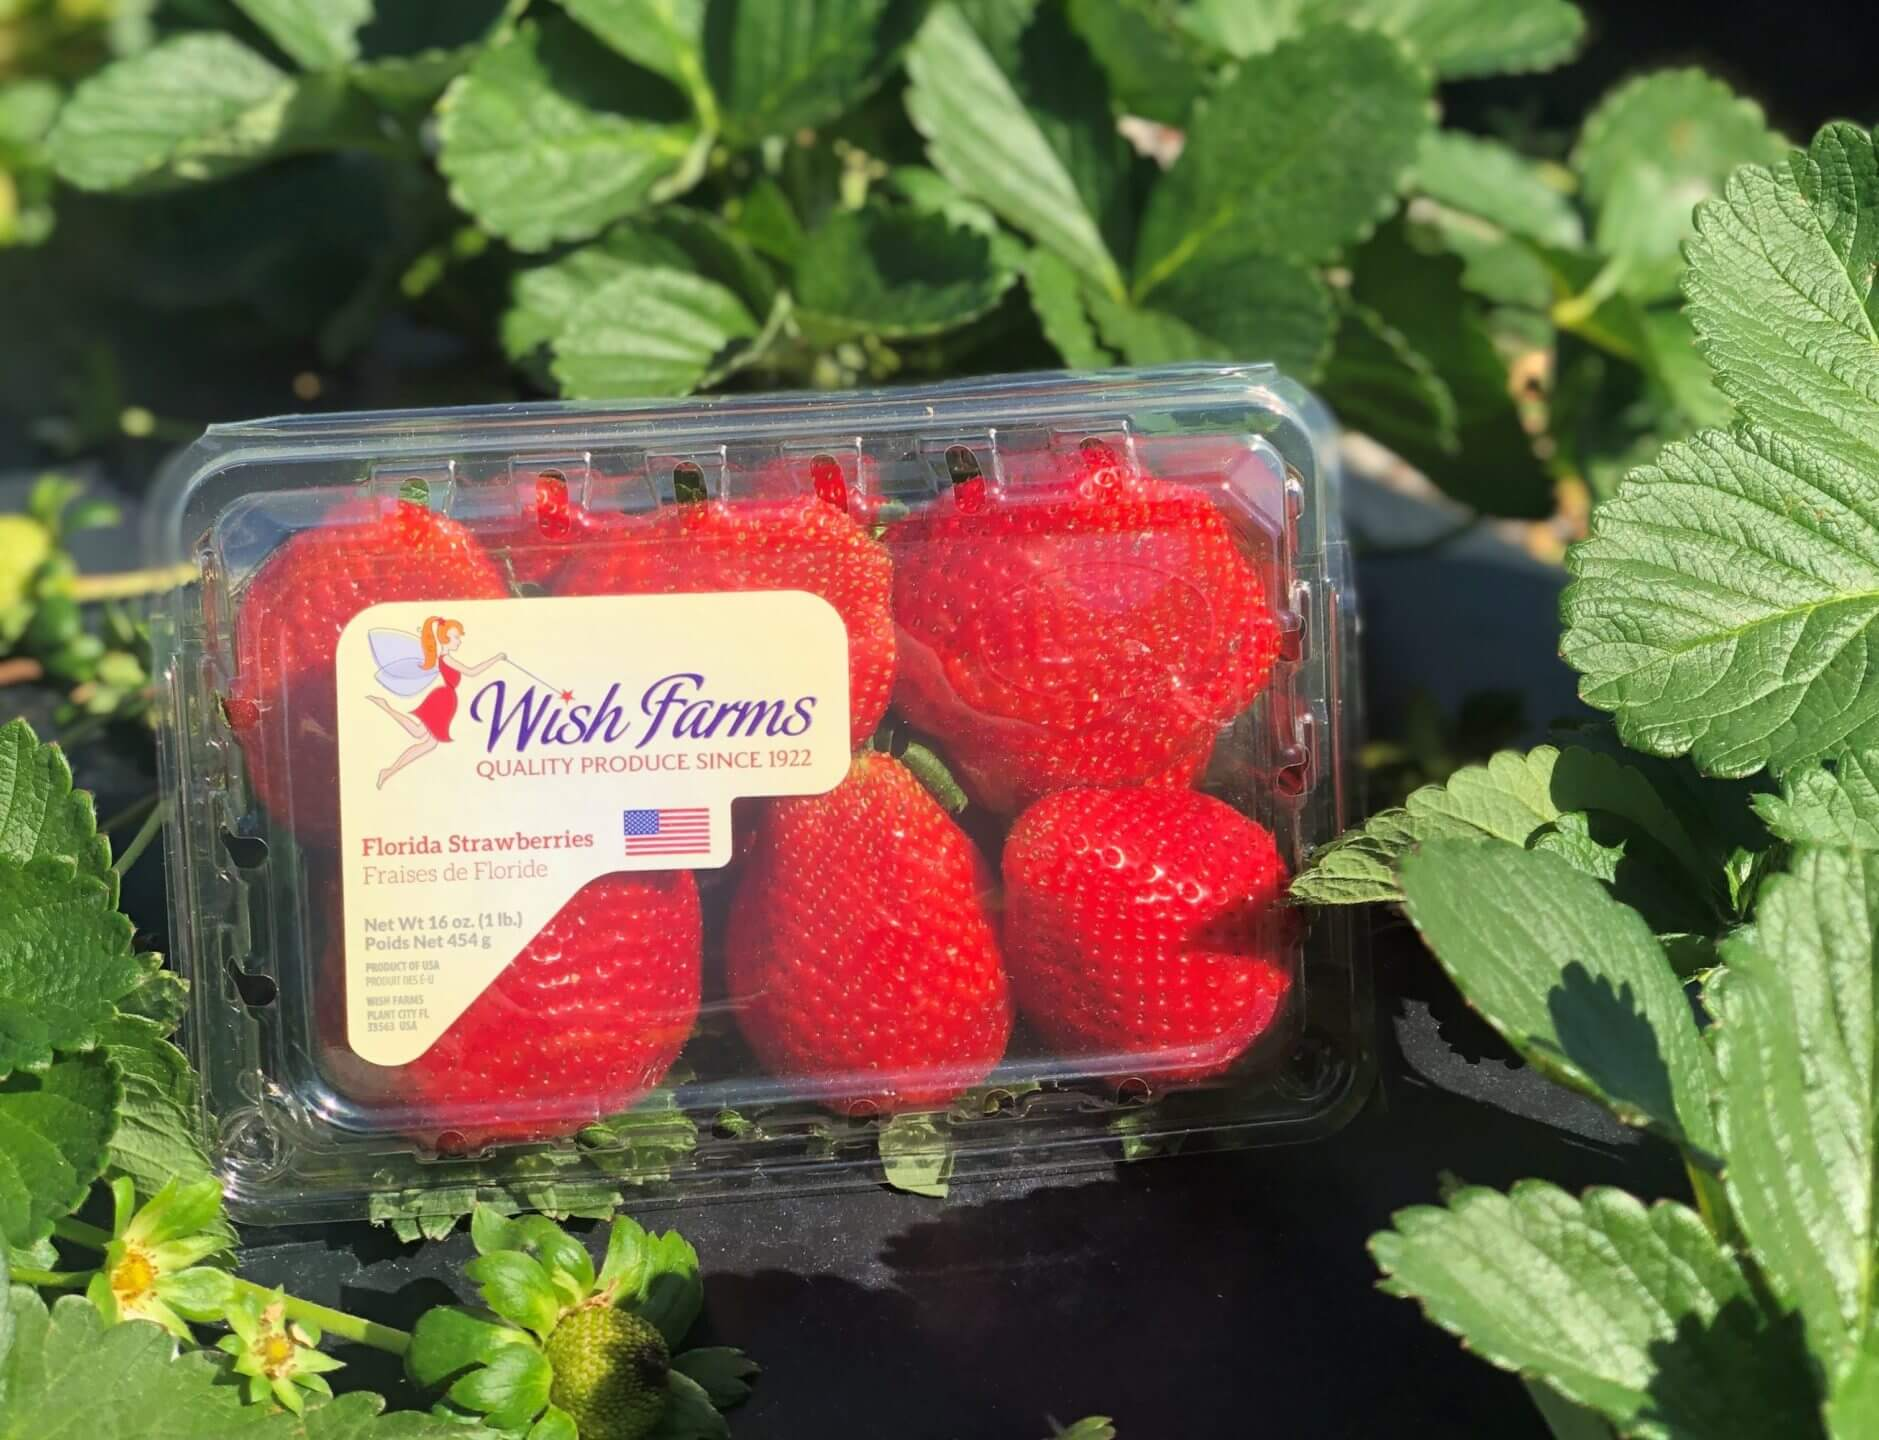 Wish Farms Giant Mega Berries in Field